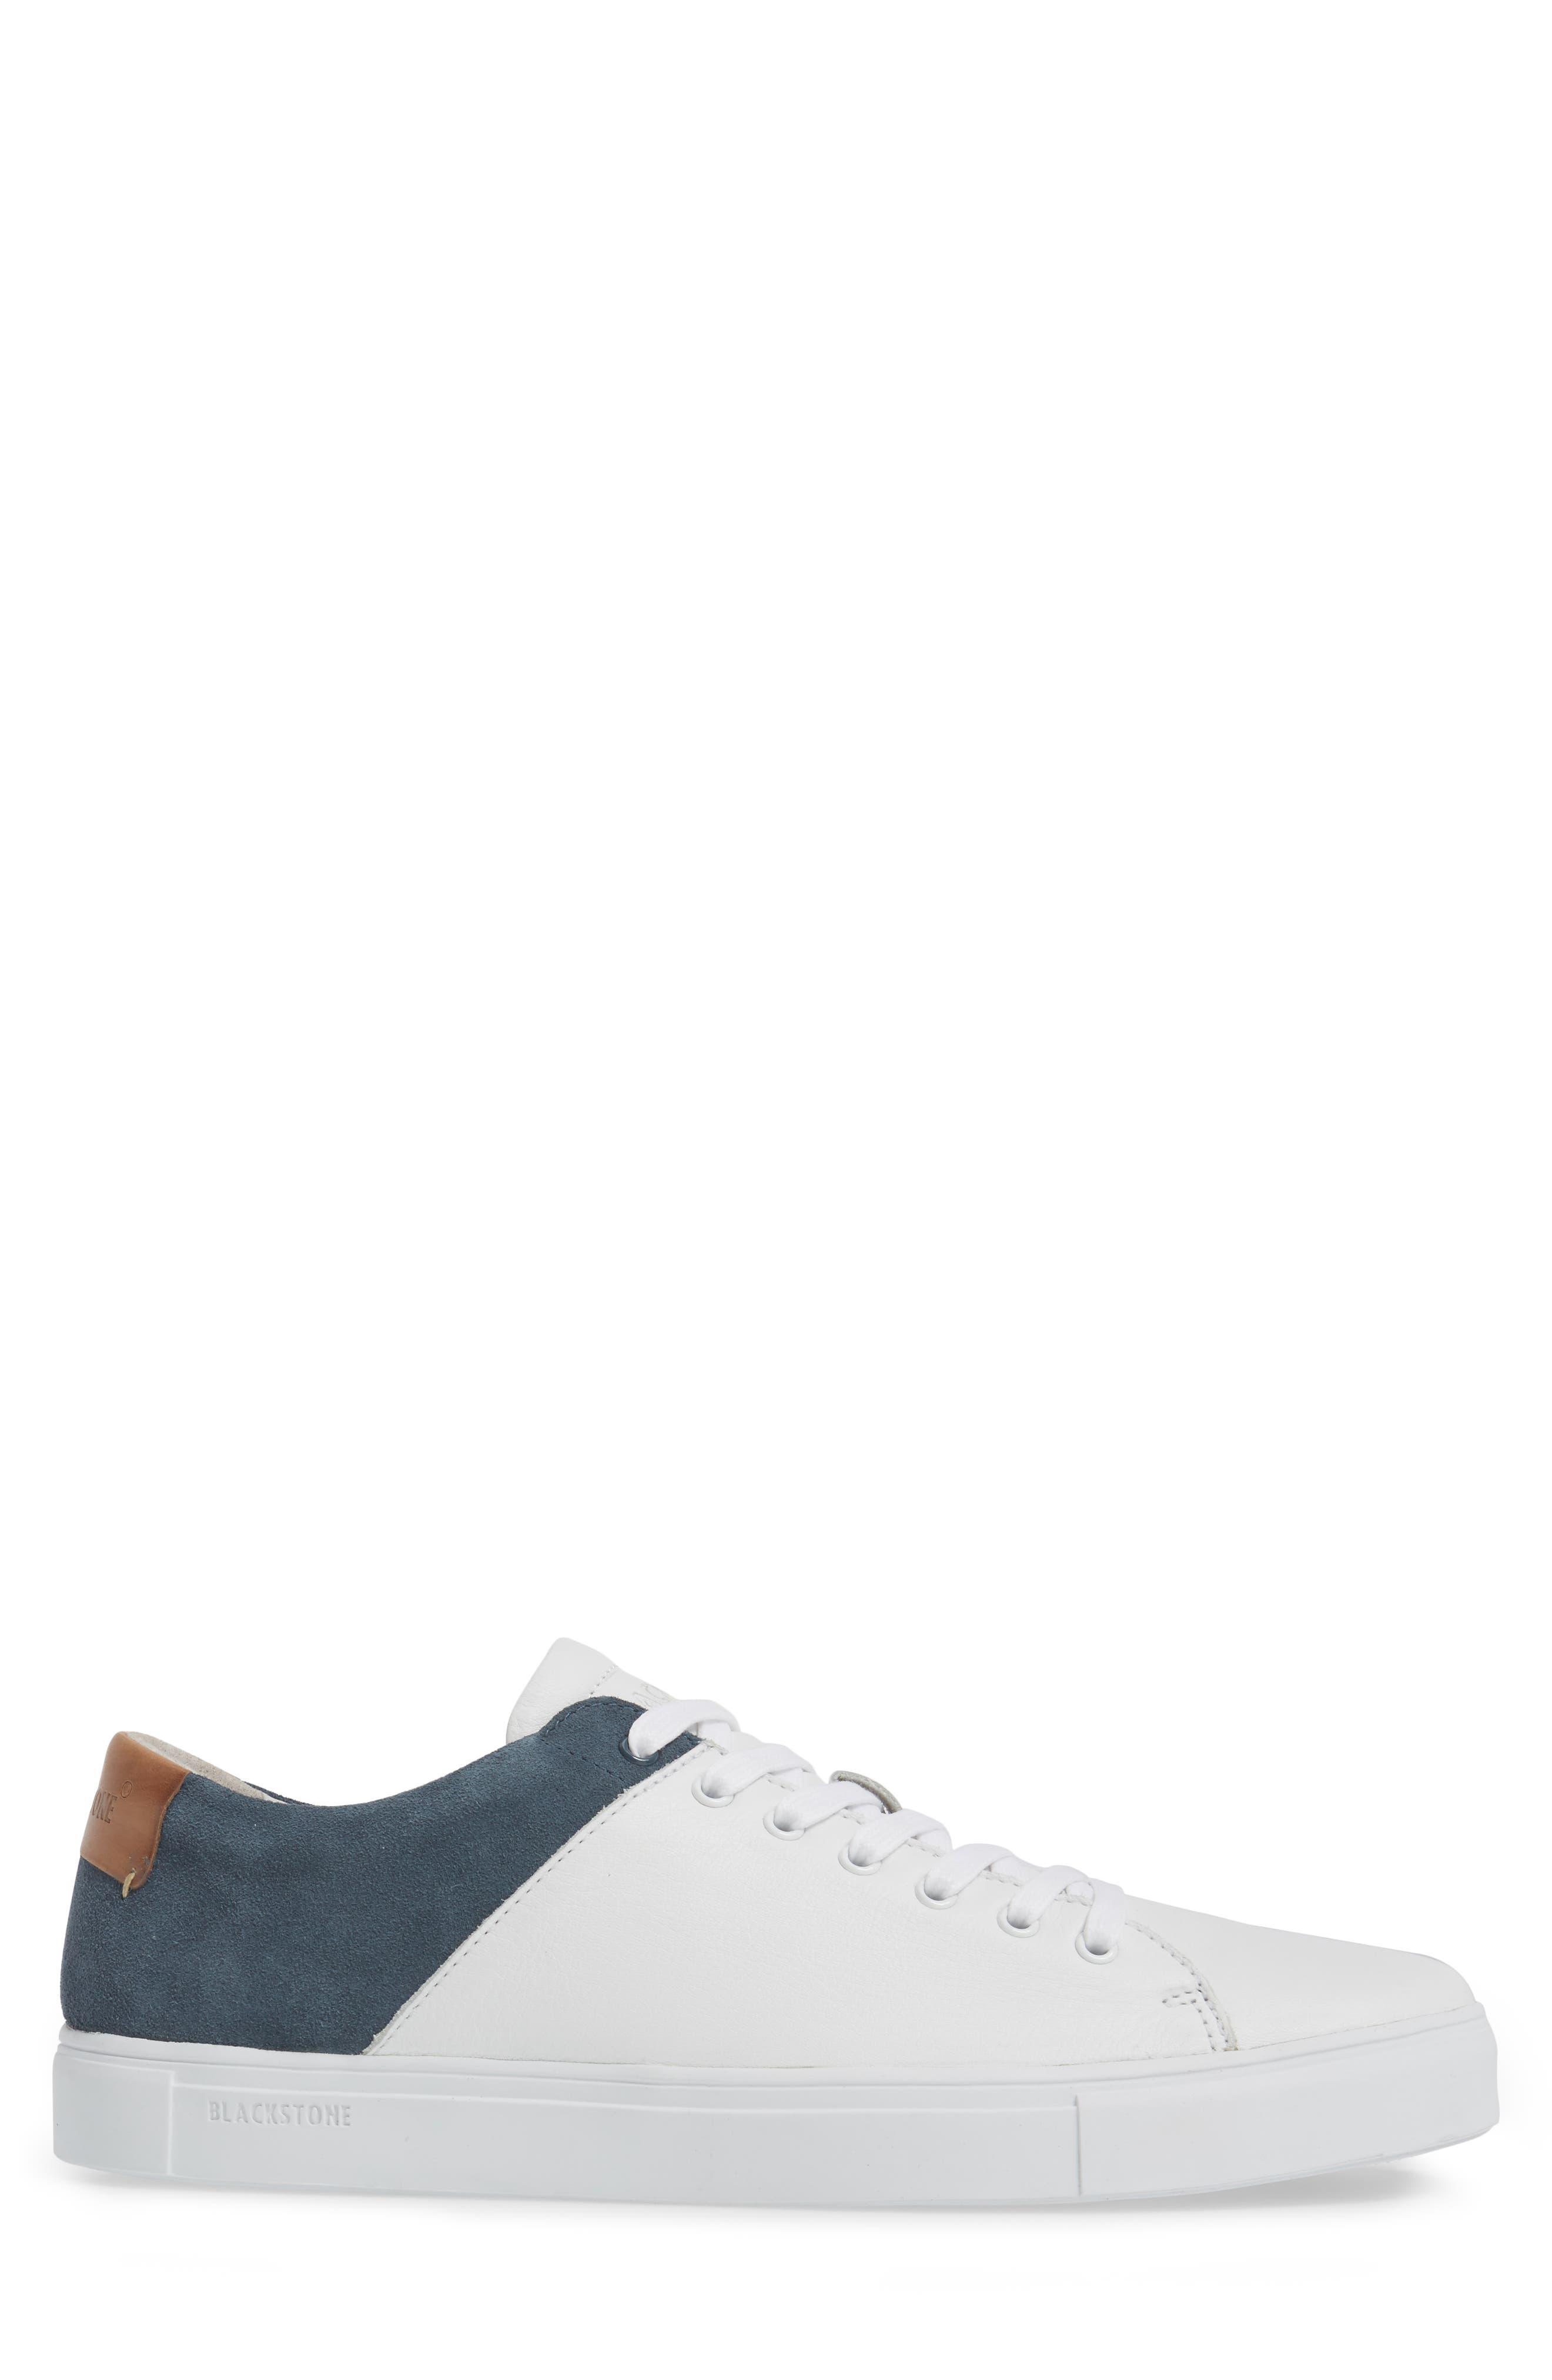 Alternate Image 3  - Blackstone NM03 Two-Tone Sneaker (Men)